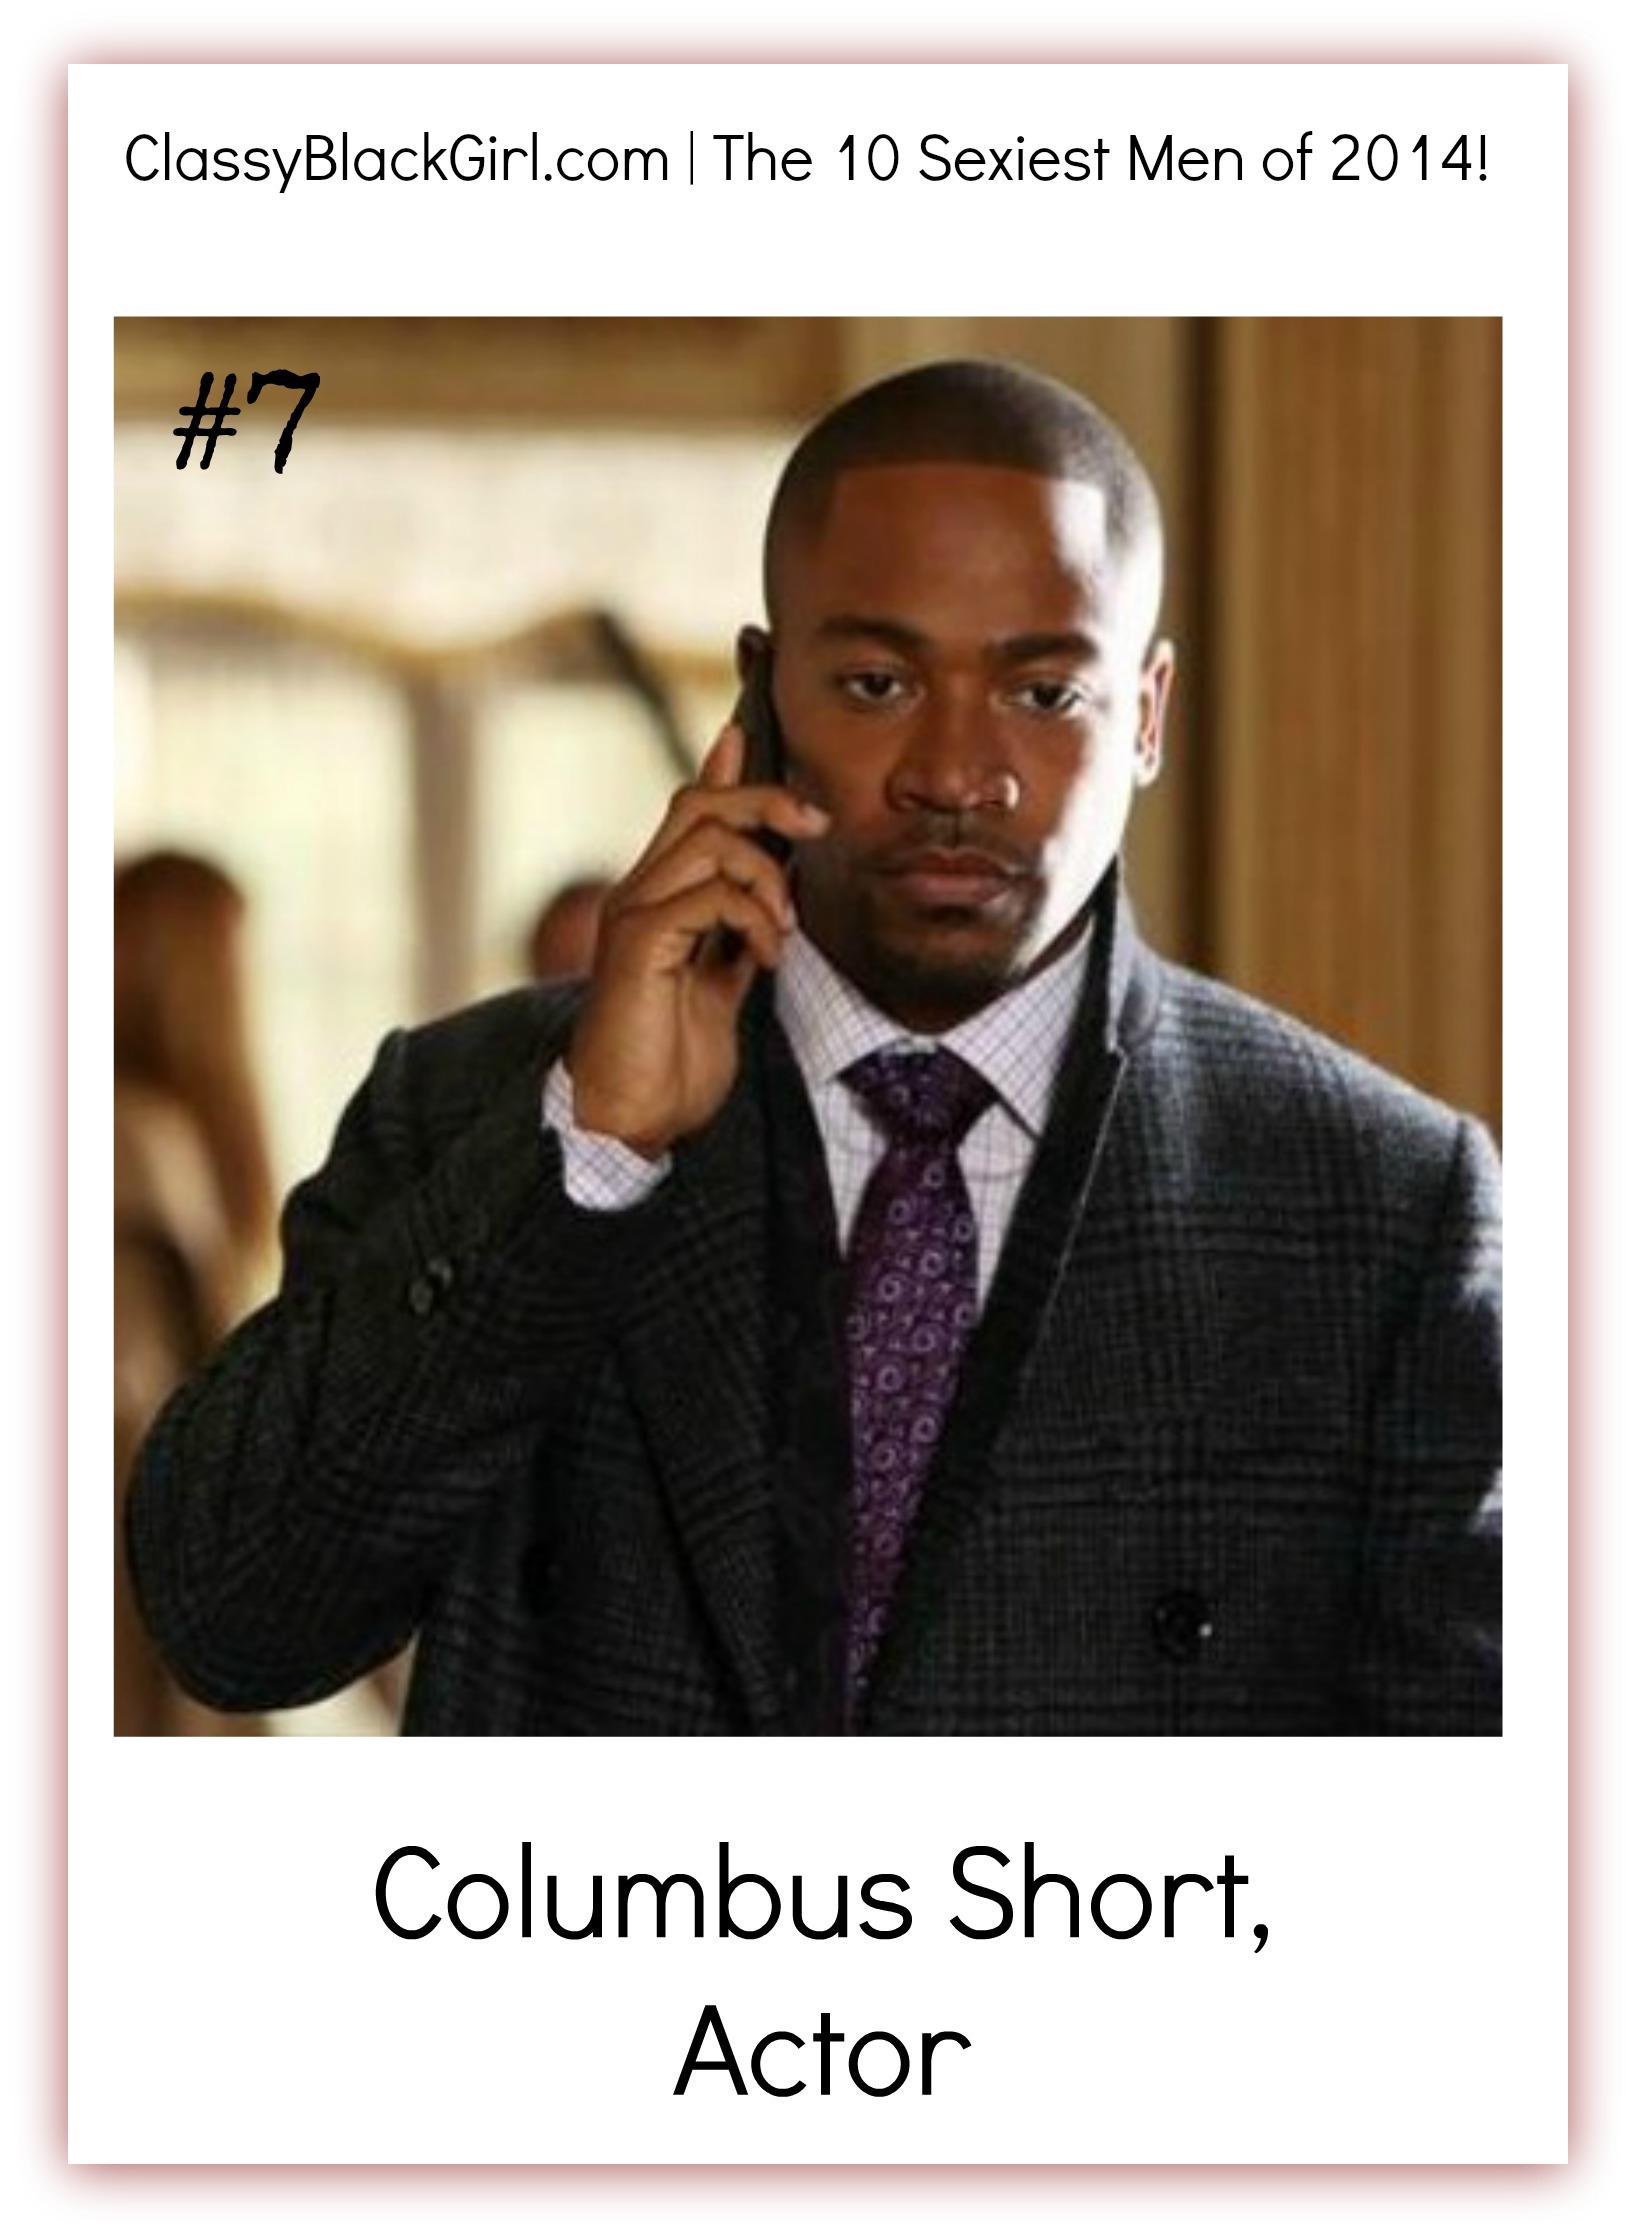 Columbus Short Classy Black Girl 10 Sexiest Men of 2014 Classy Black Girl